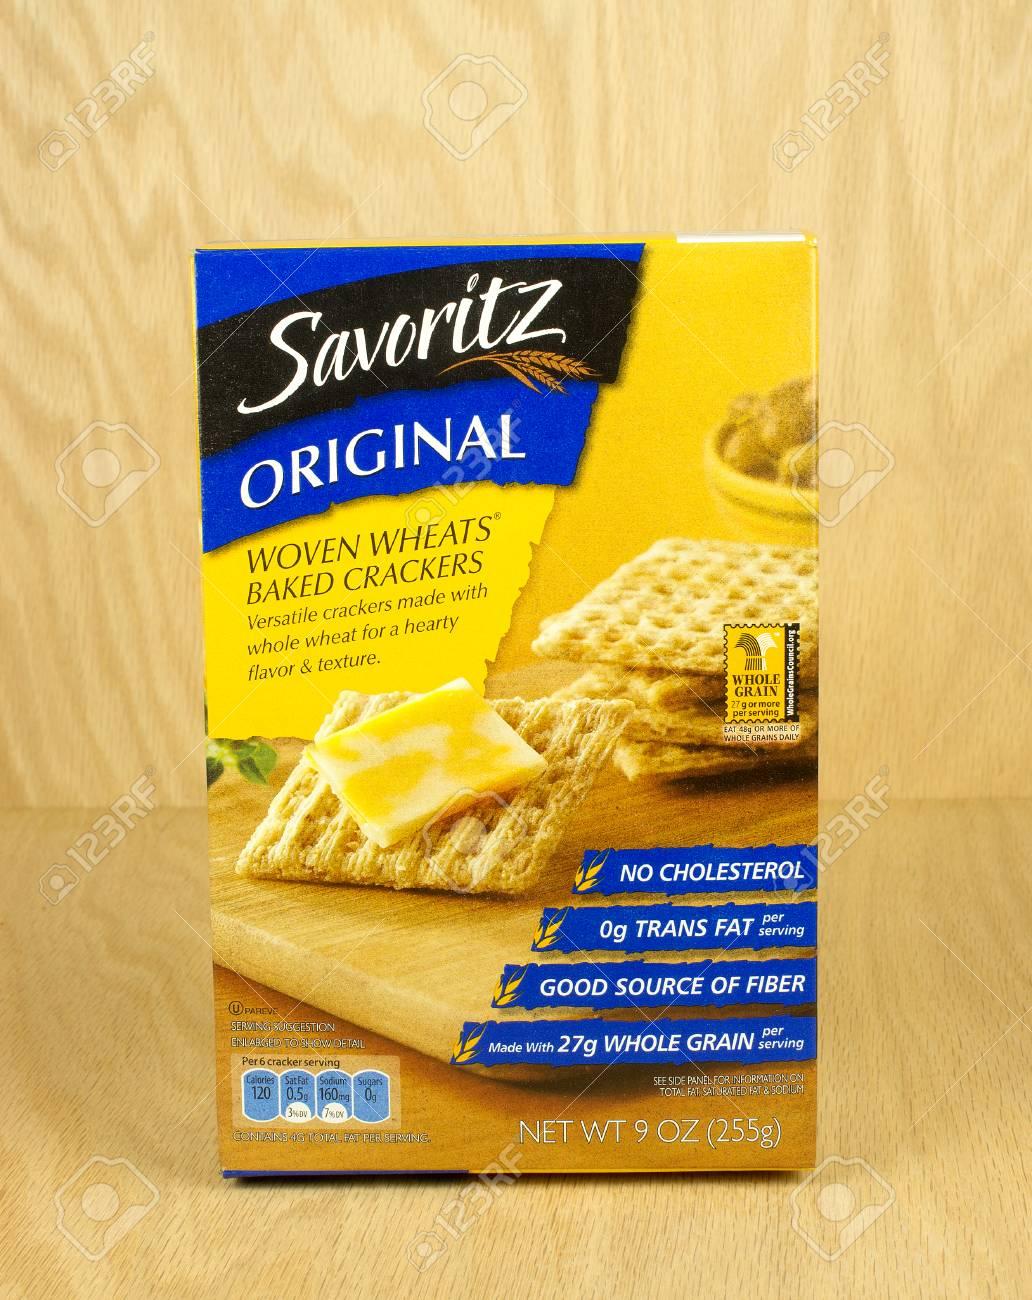 River Falls Wisconsin August 26 2017 A Box Of Savoritz Brand